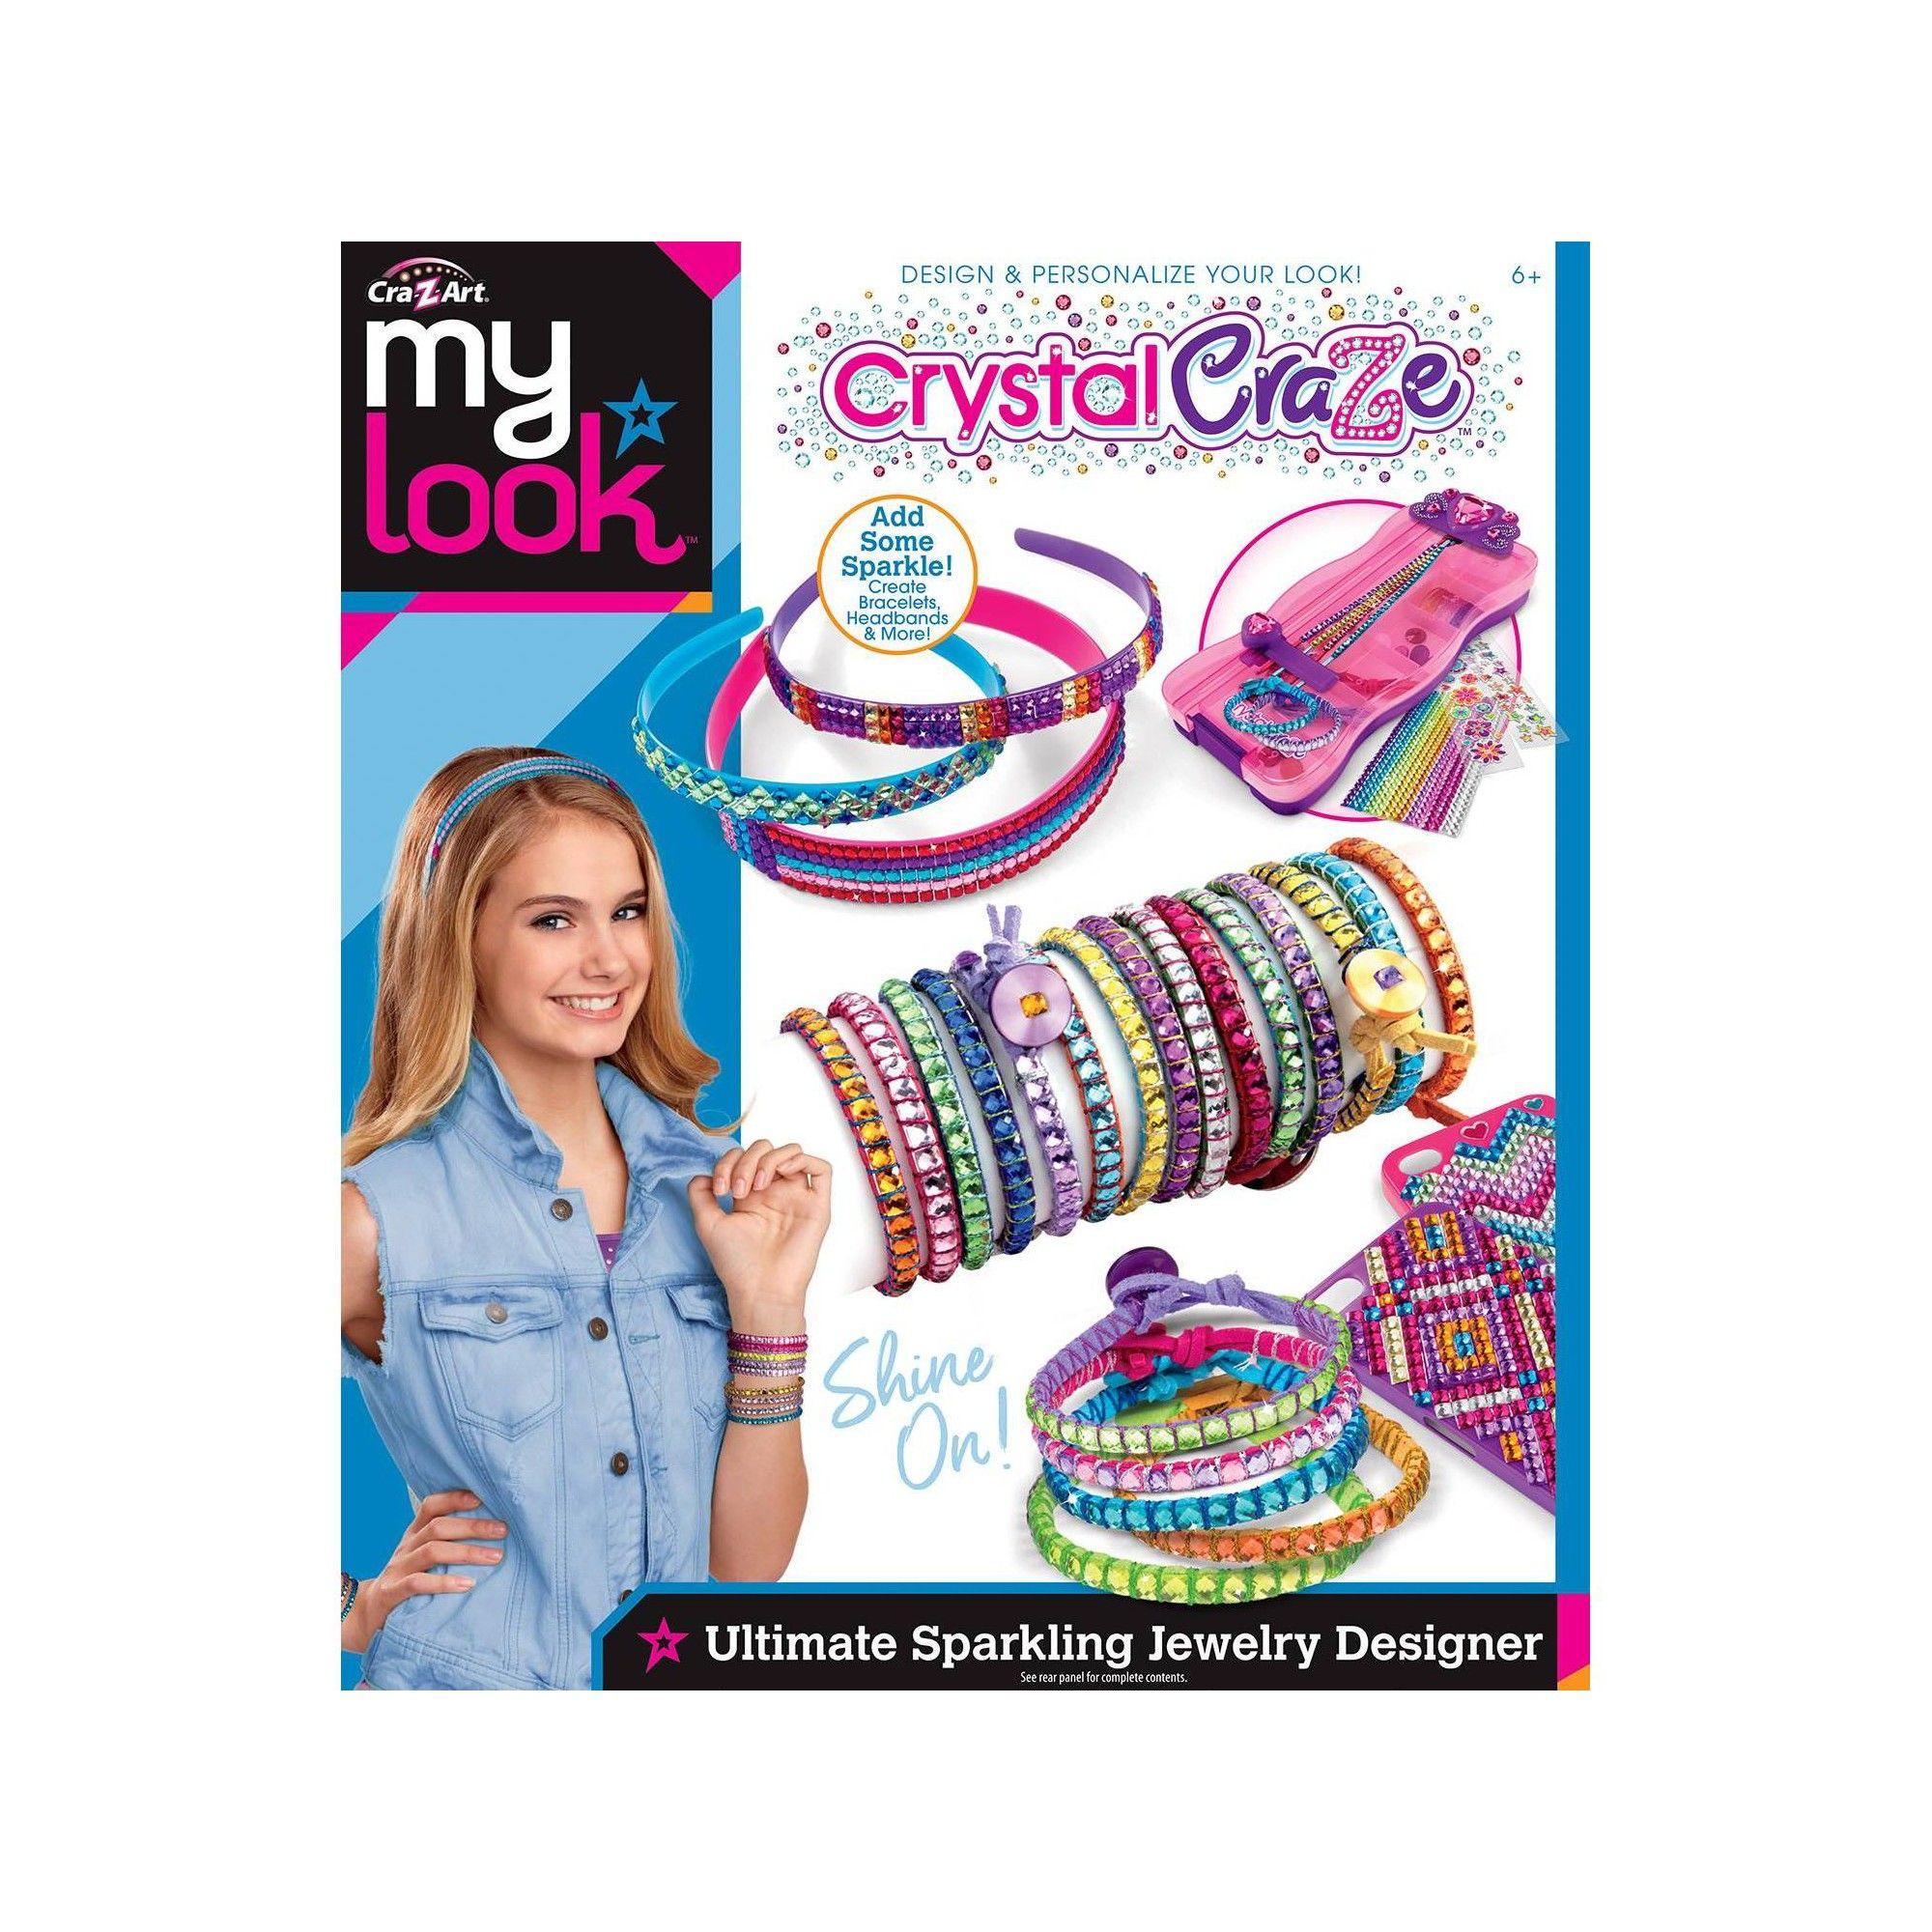 My Look Crystal Craze Sparkling Gem Creations By Cra Z Art In 2020 Z Arts Pretty Headbands Sparkle